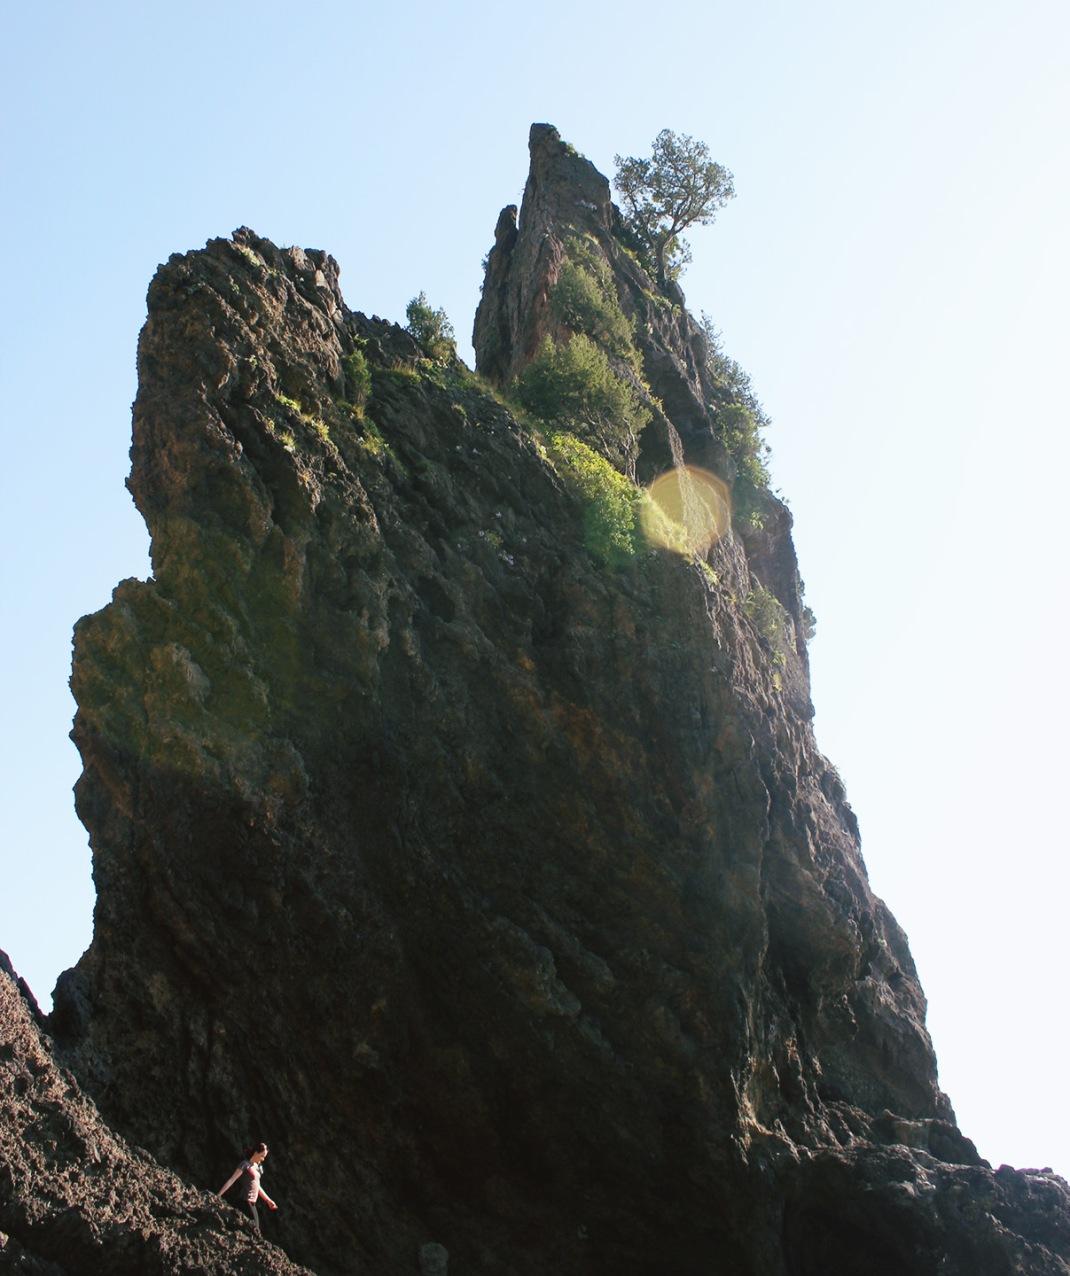 Ulleungdo, Korea